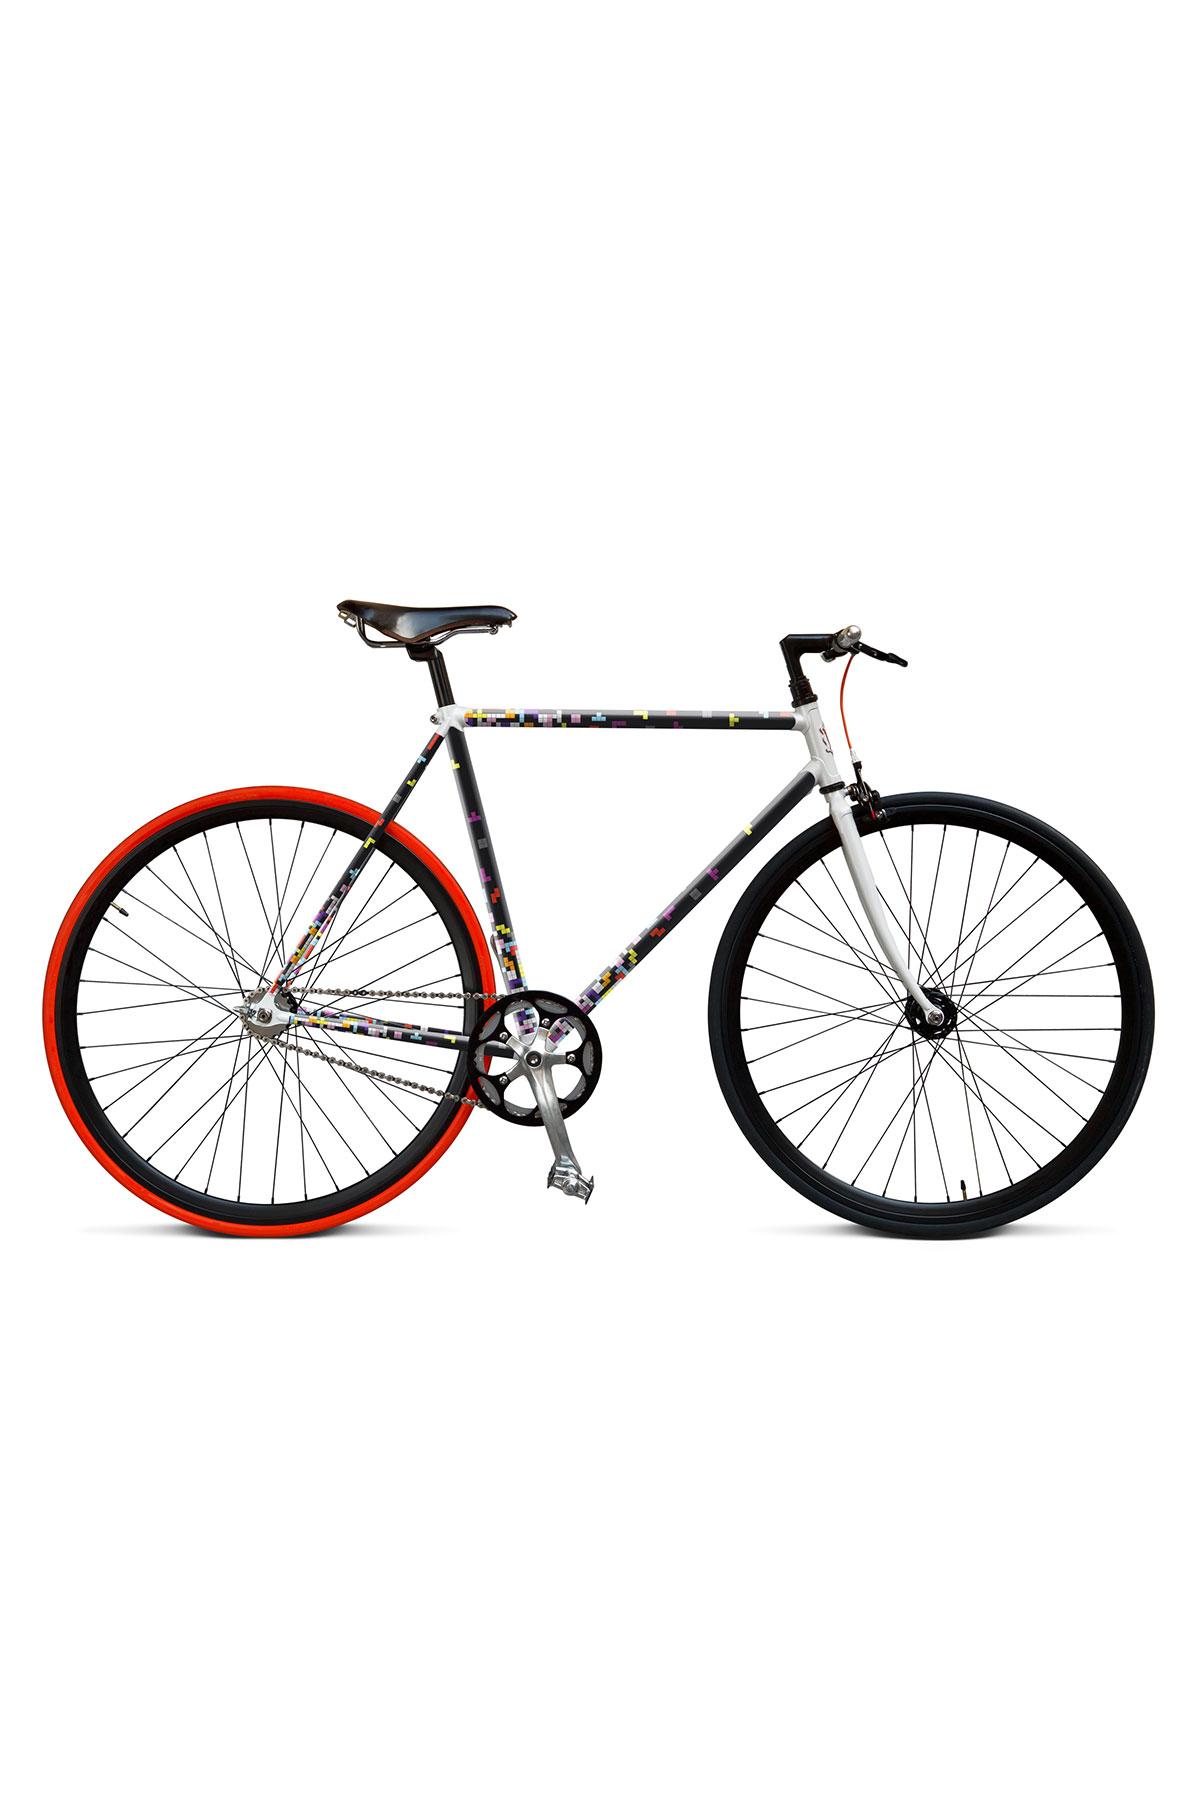 bicycle tournament